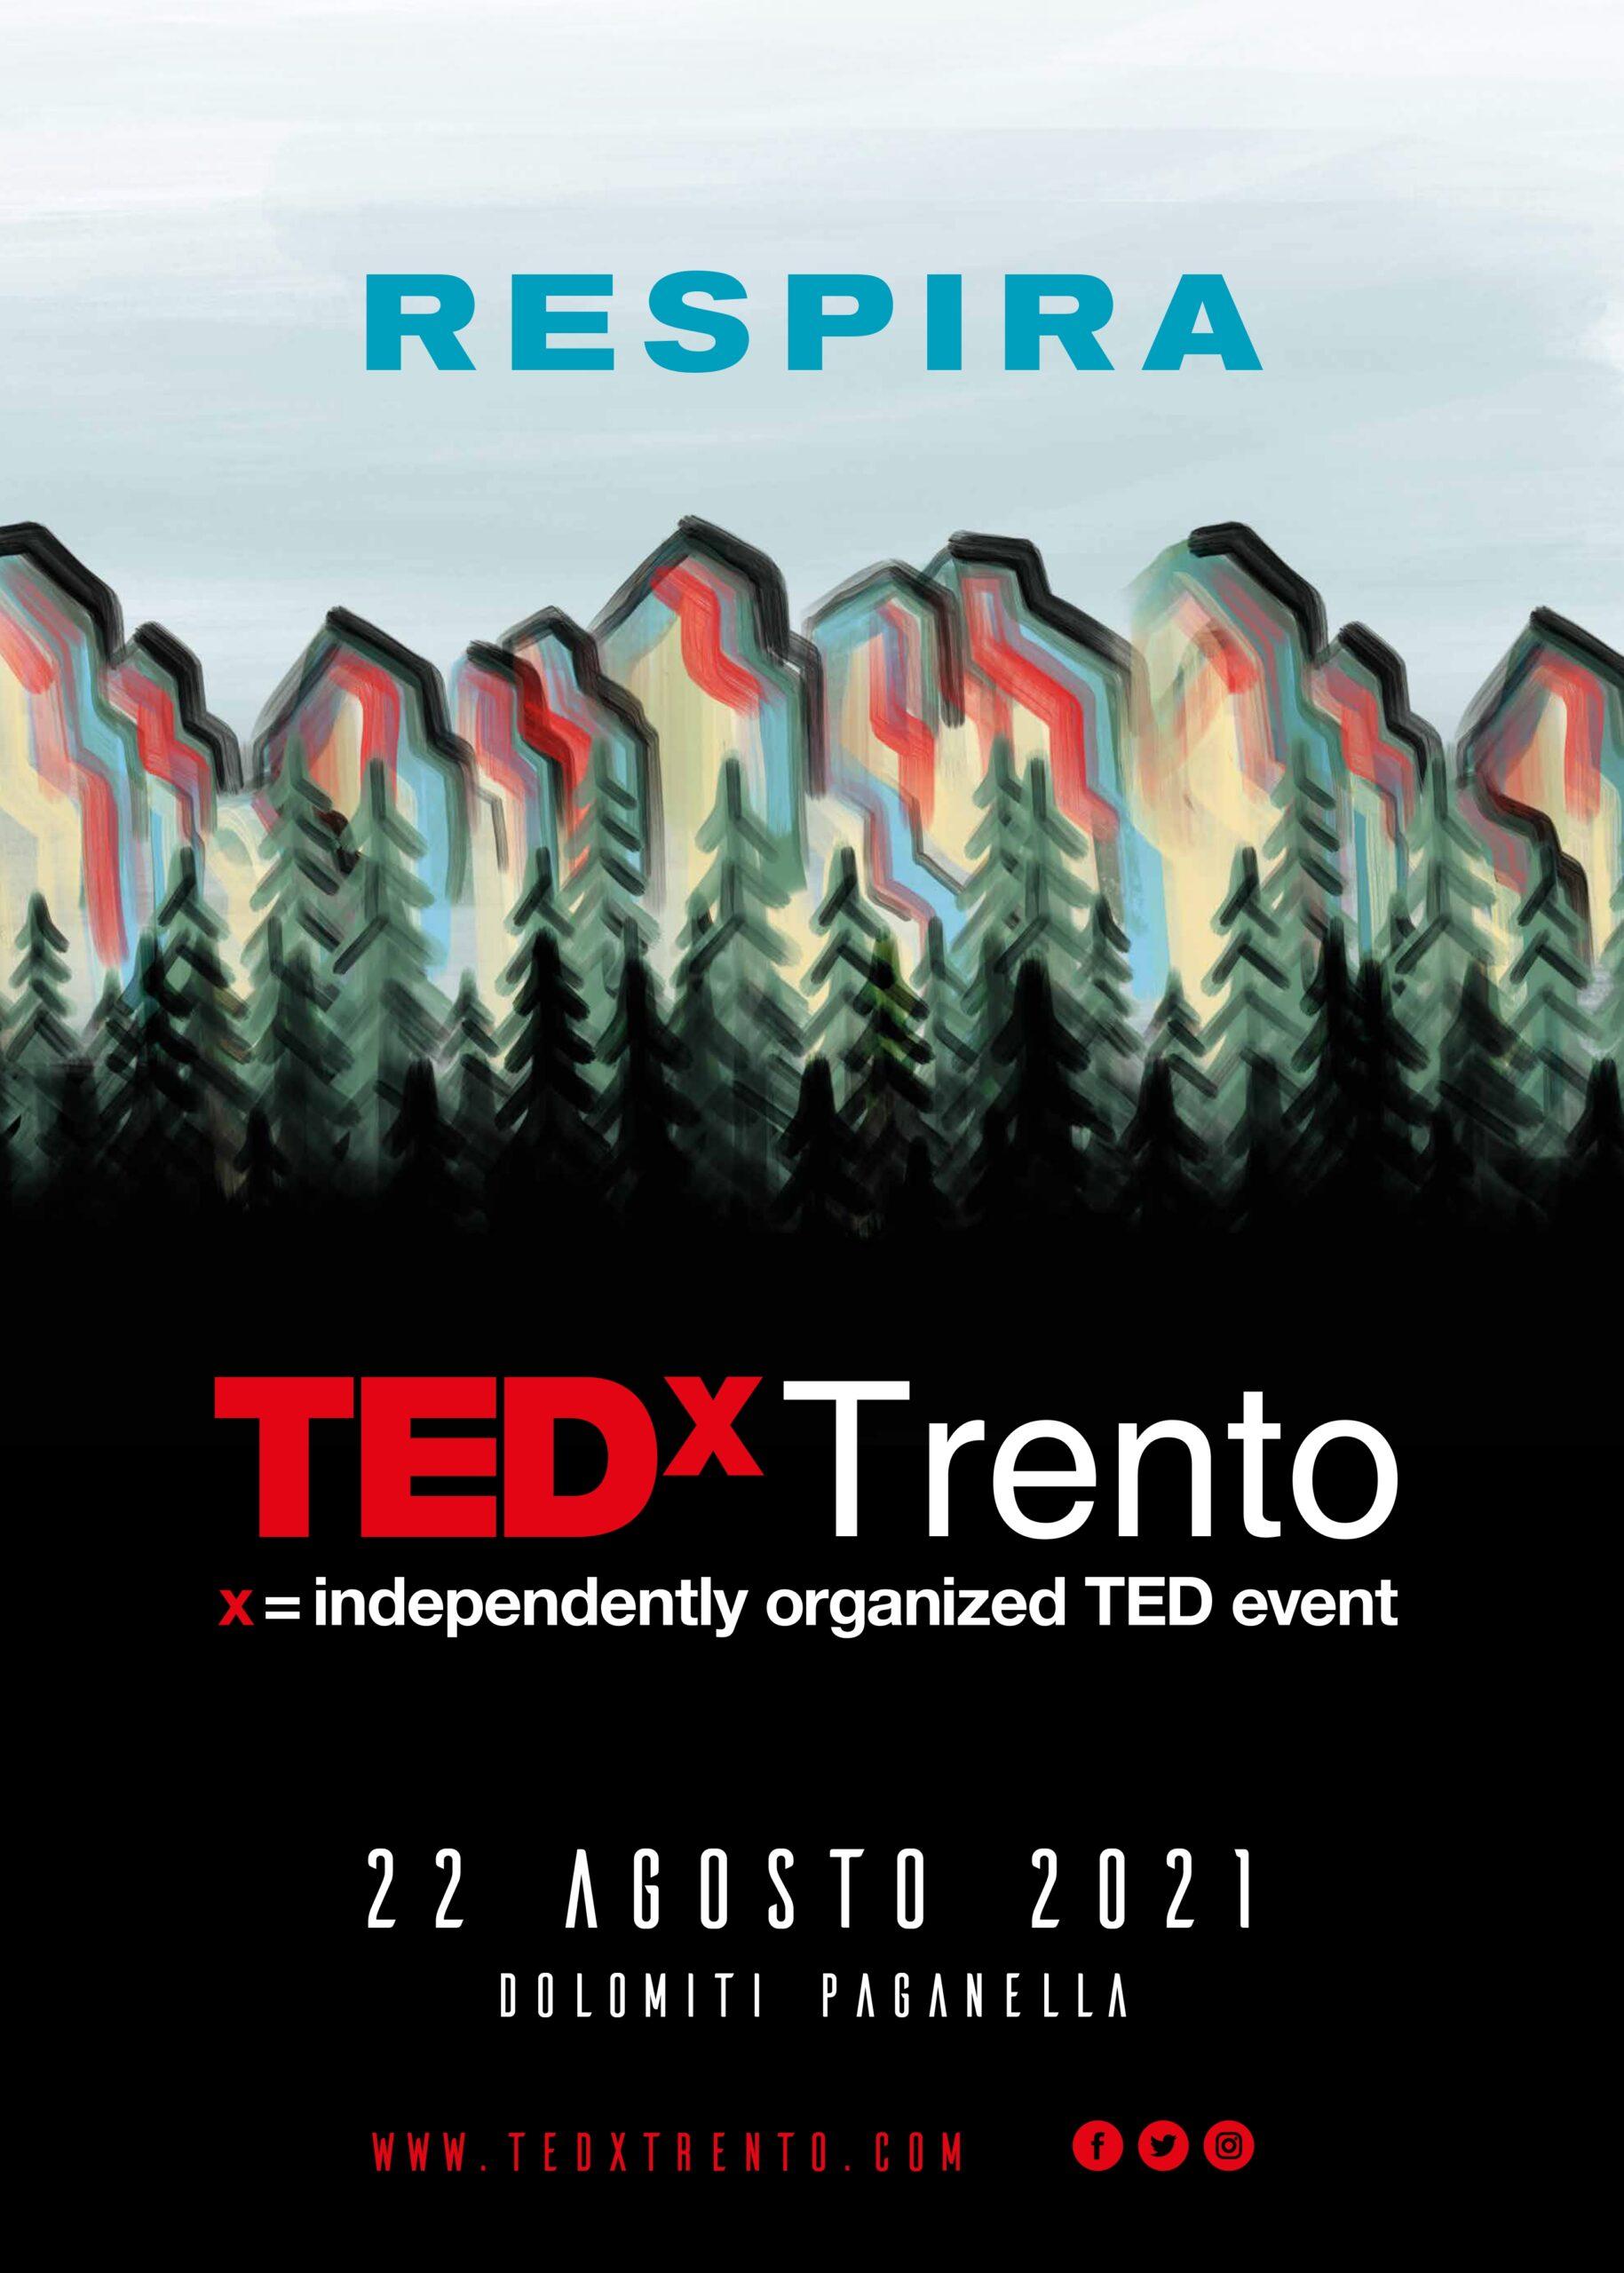 TEDxTrento Respira Mountain Future Festival